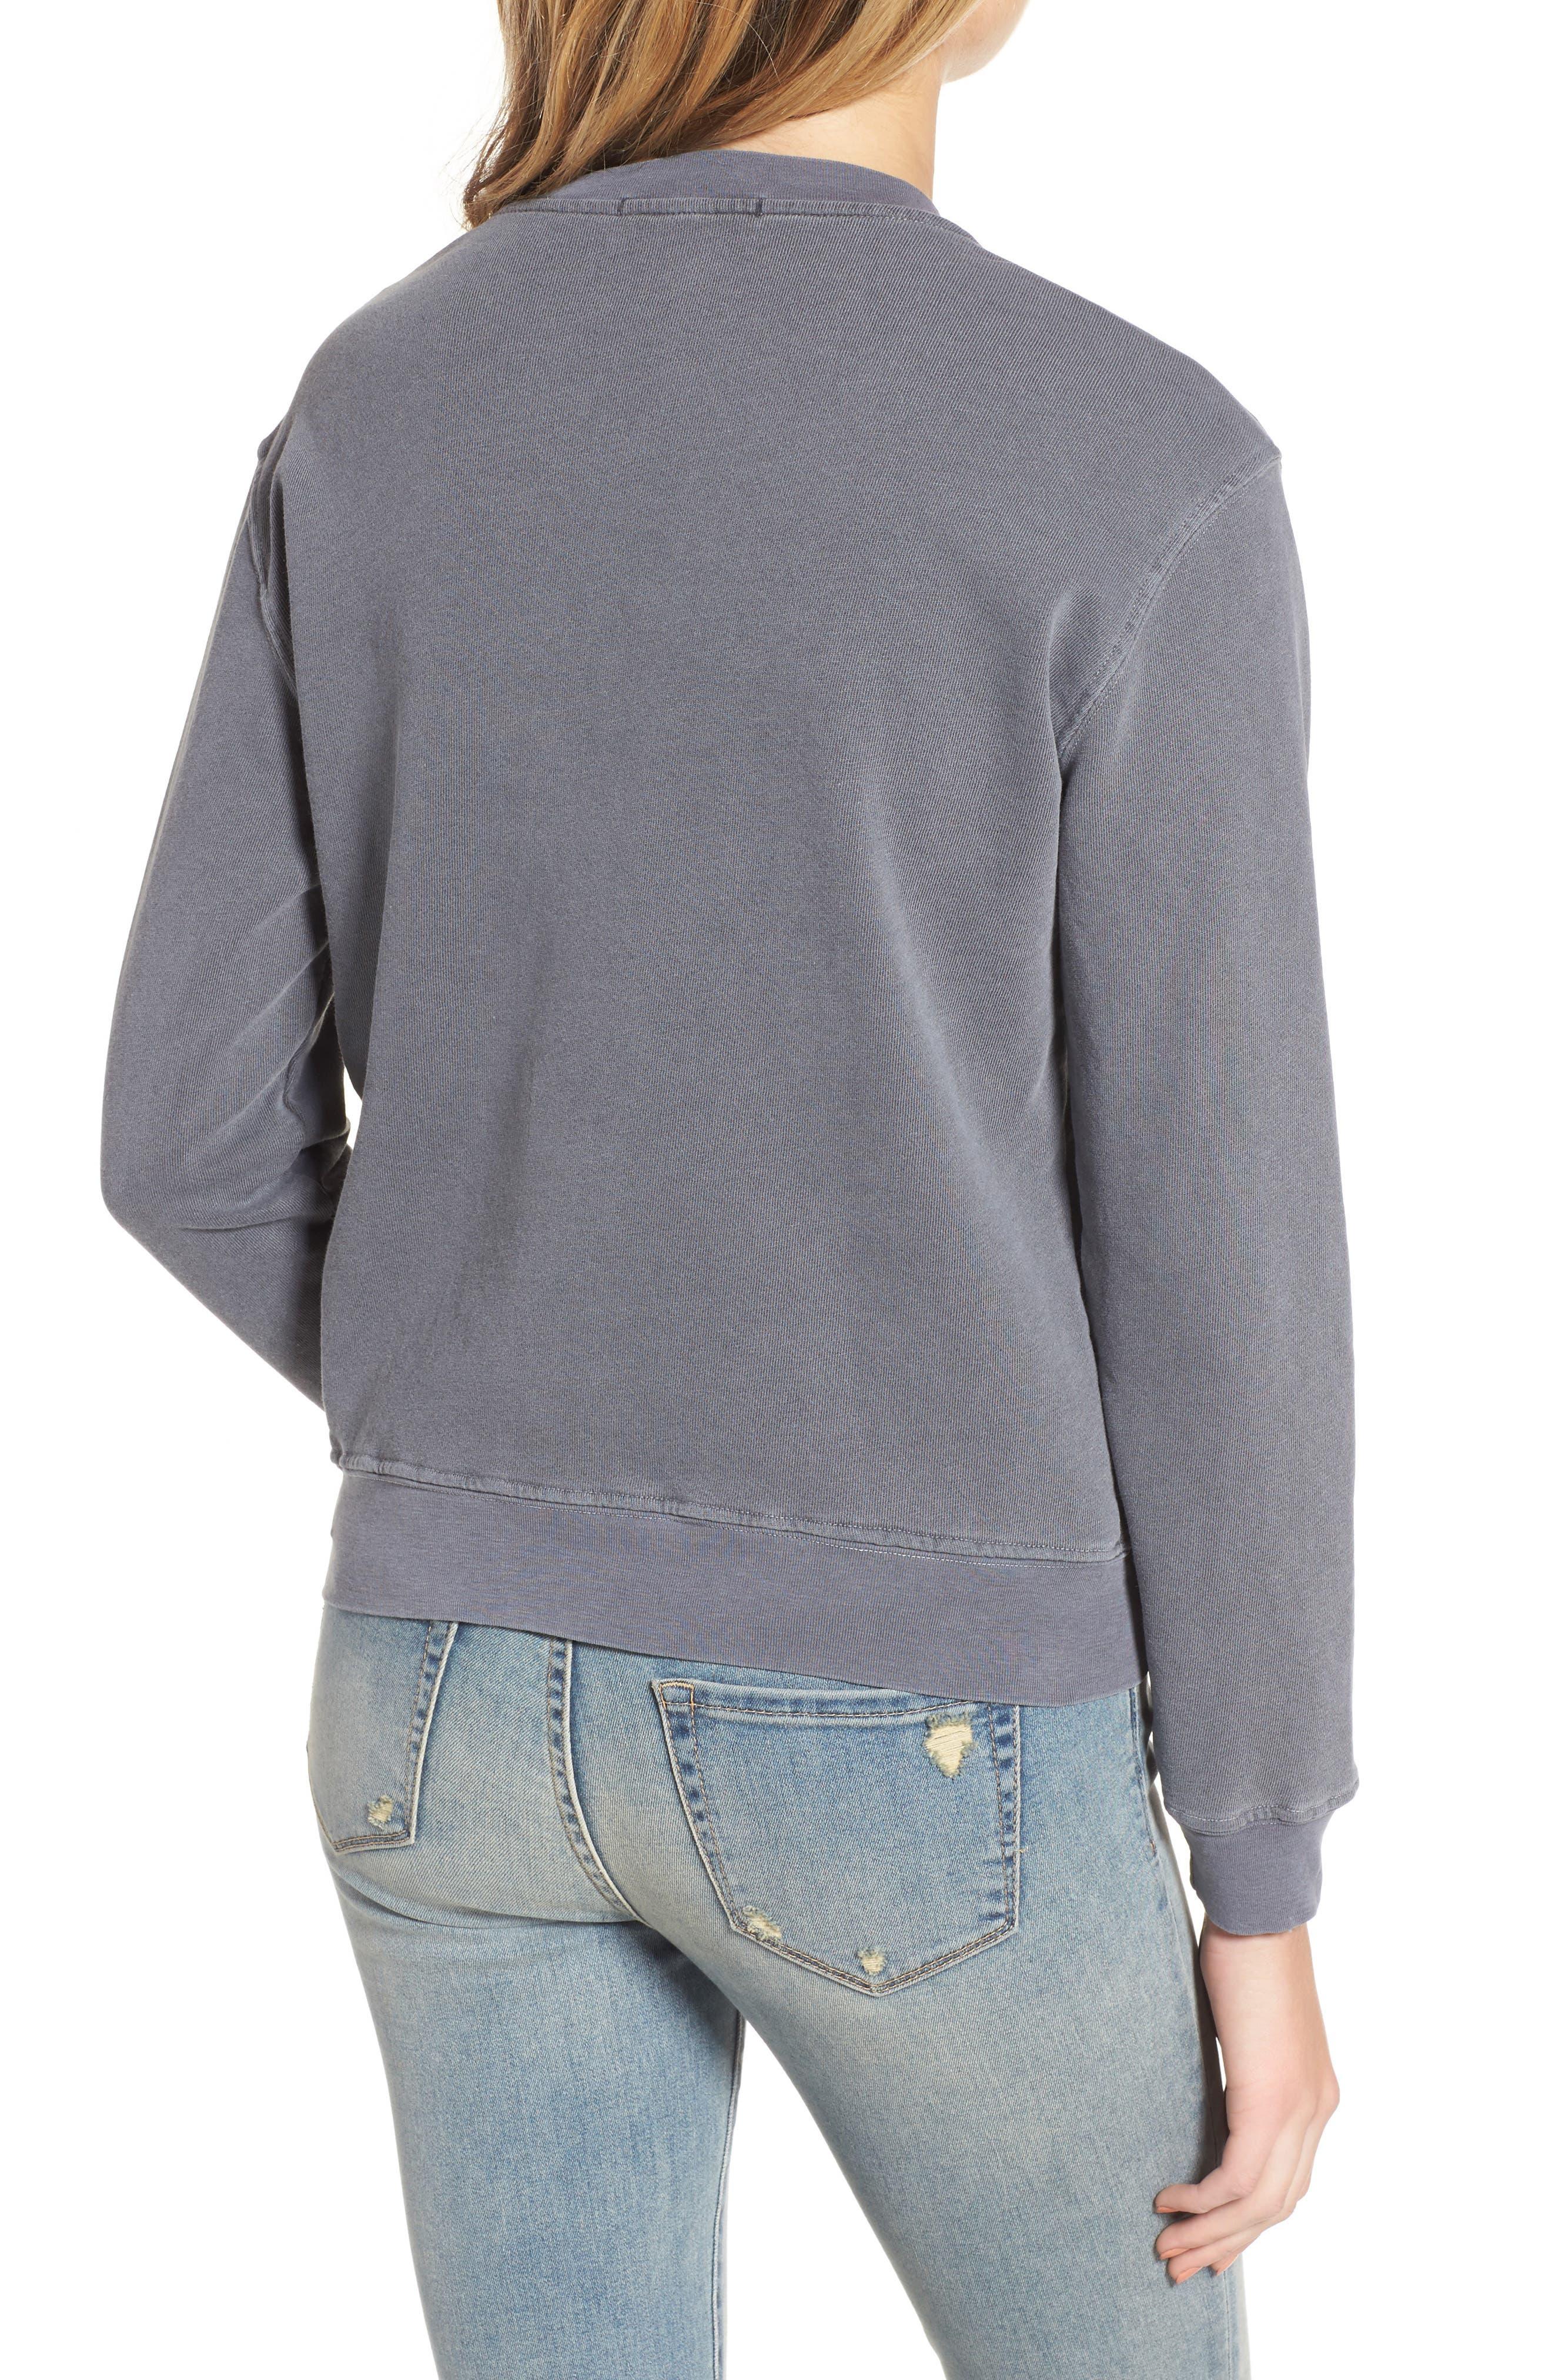 Alternate Image 2  - Stateside Lace Trim Sweatshirt